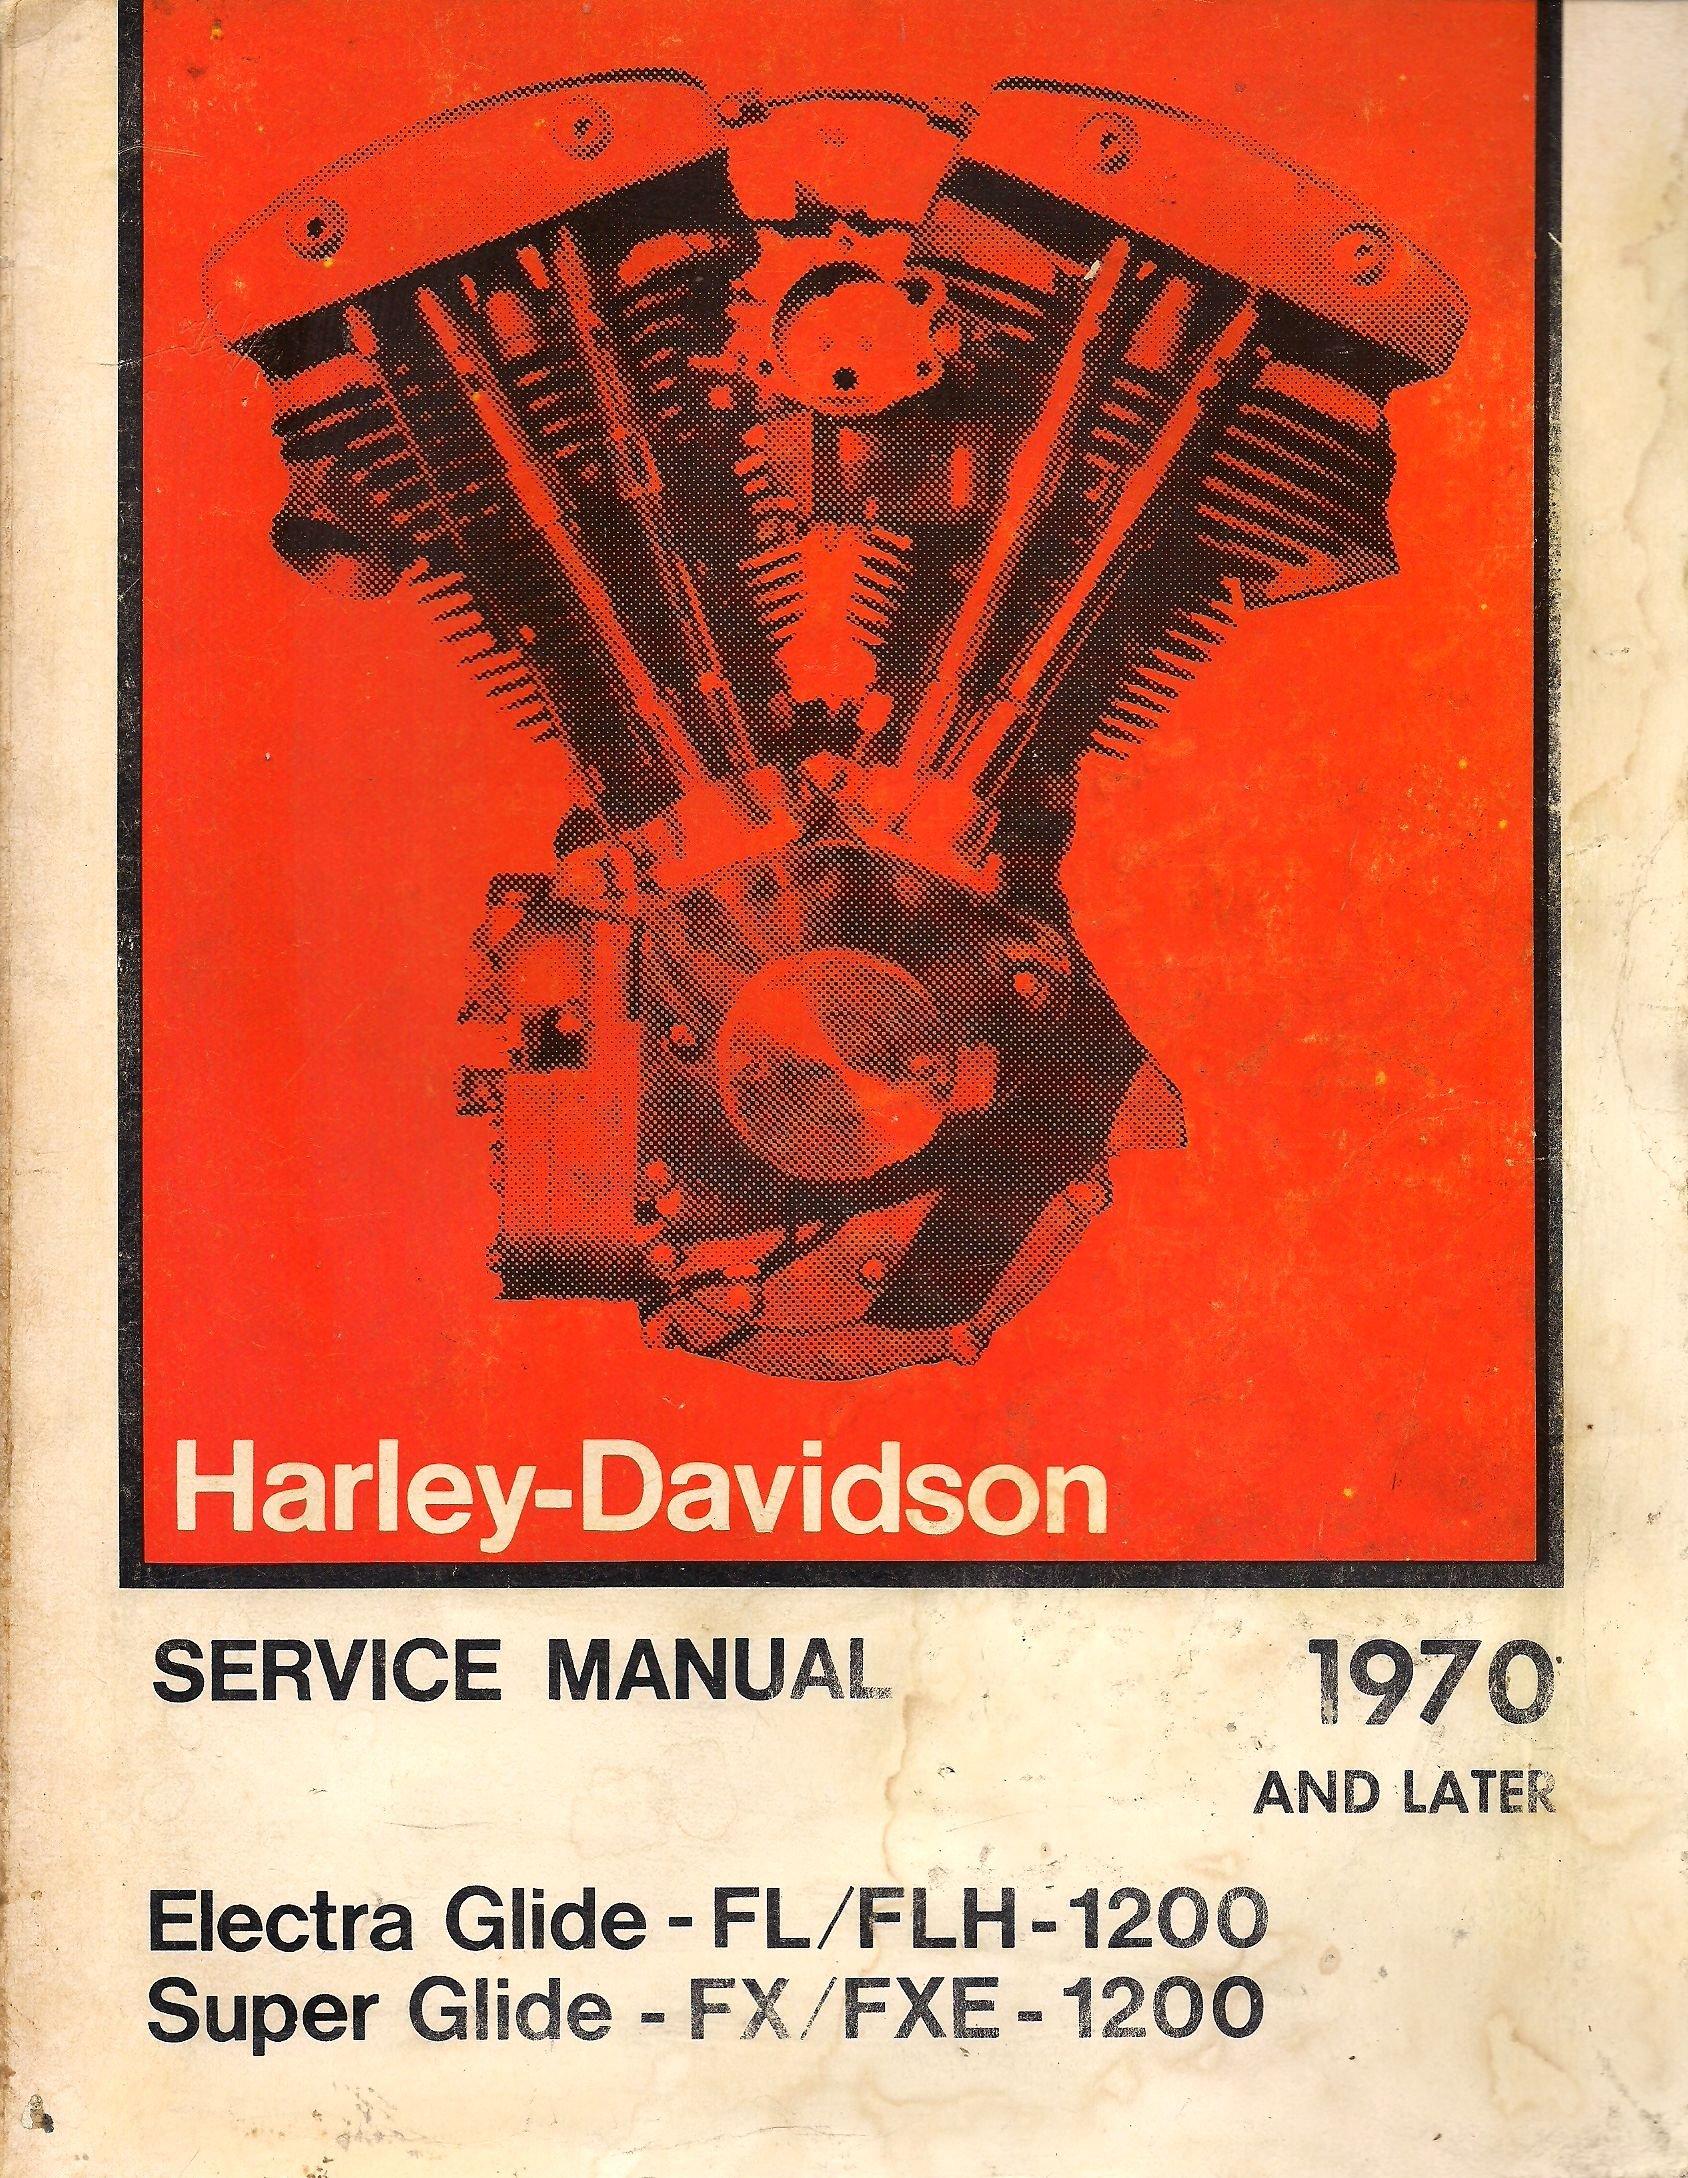 Harley-Davidson Service Manual 1970 to 1975 Electra Glide FL/FLH-1200 Super  Glide FX/FXE-1200: Harley-Davidson: Amazon.com: Books